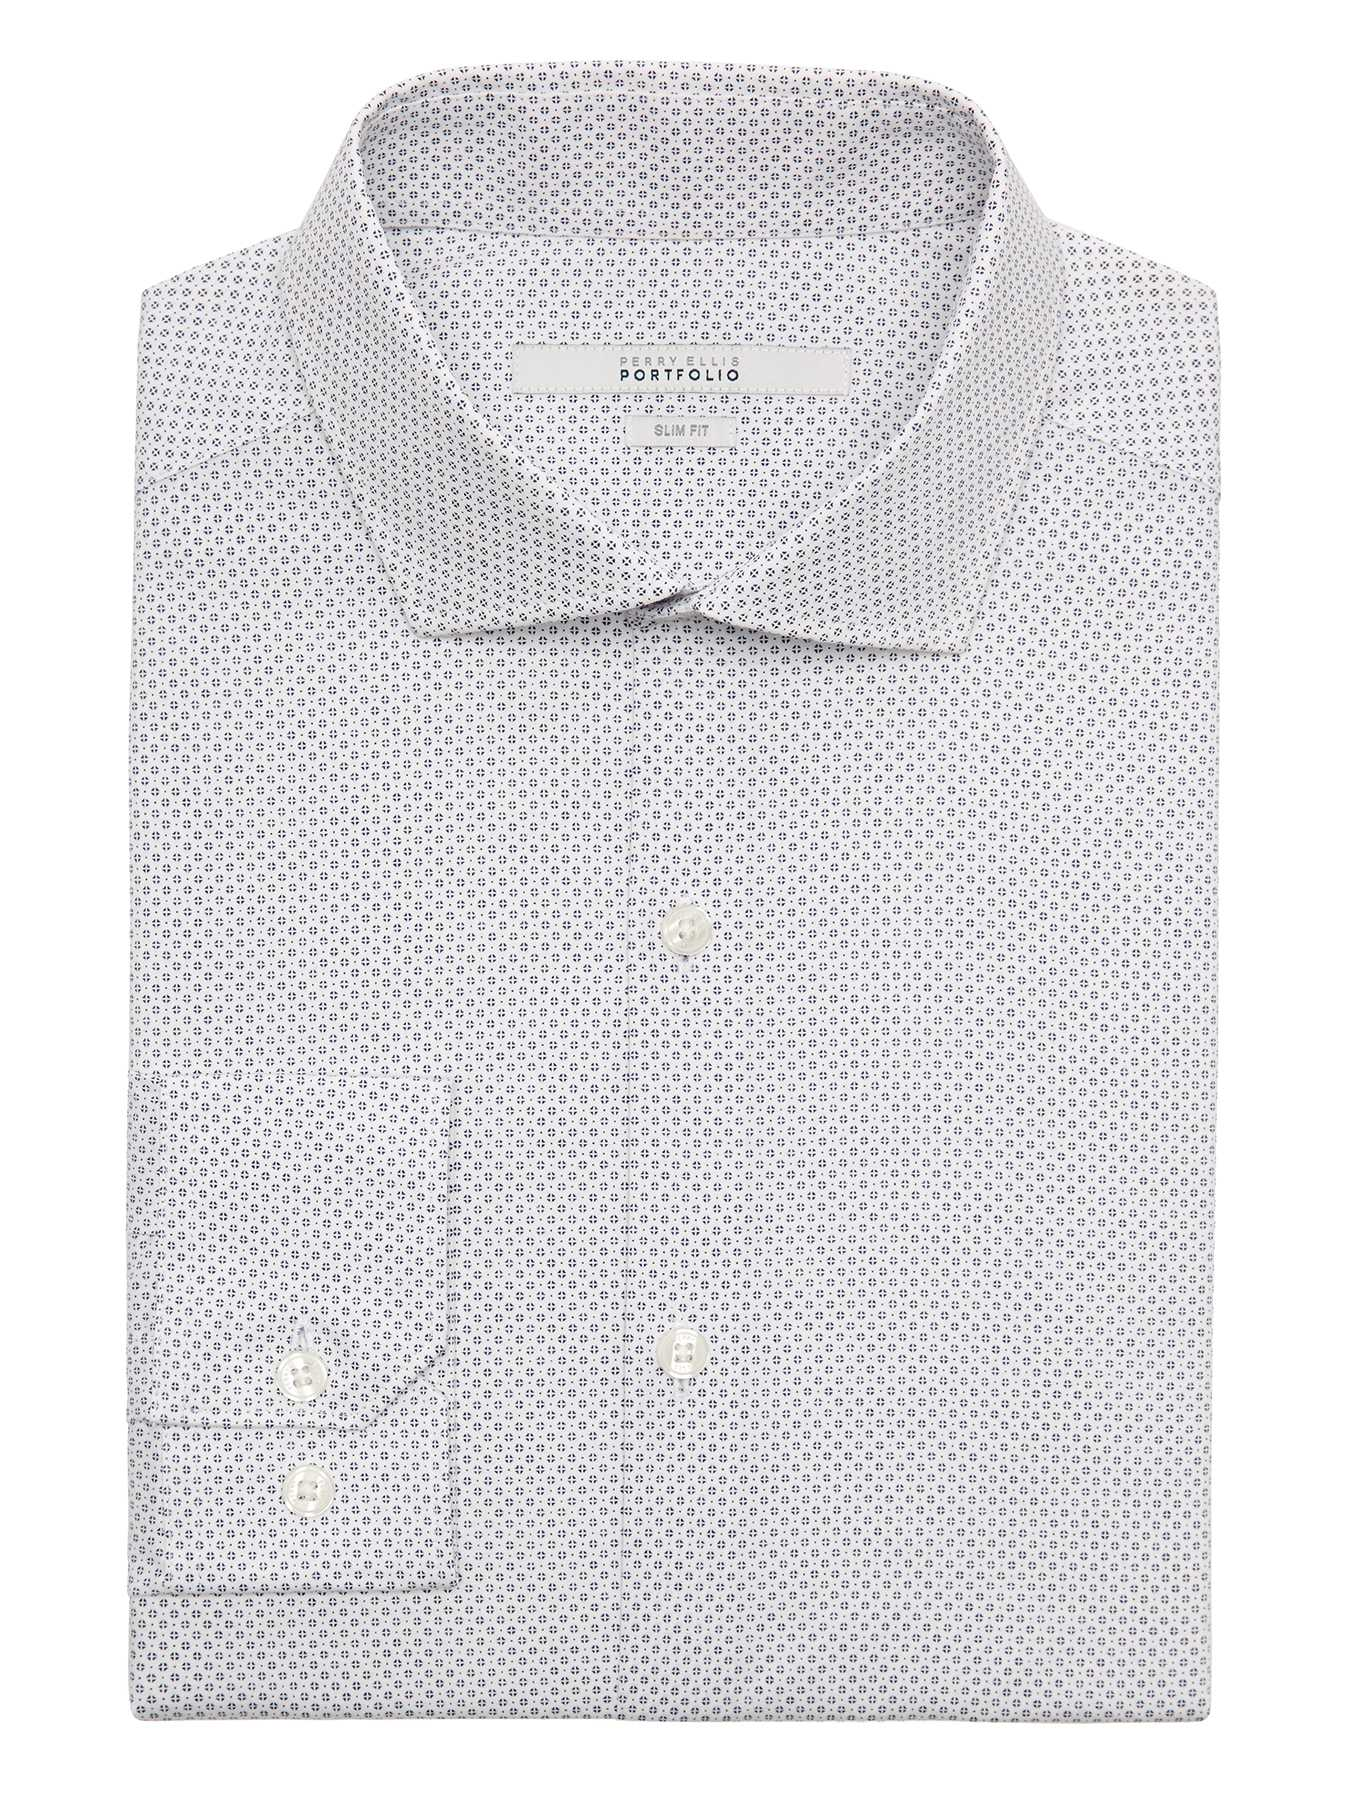 Perry Ellis Very Slim Diamond Dot Dress Shirt